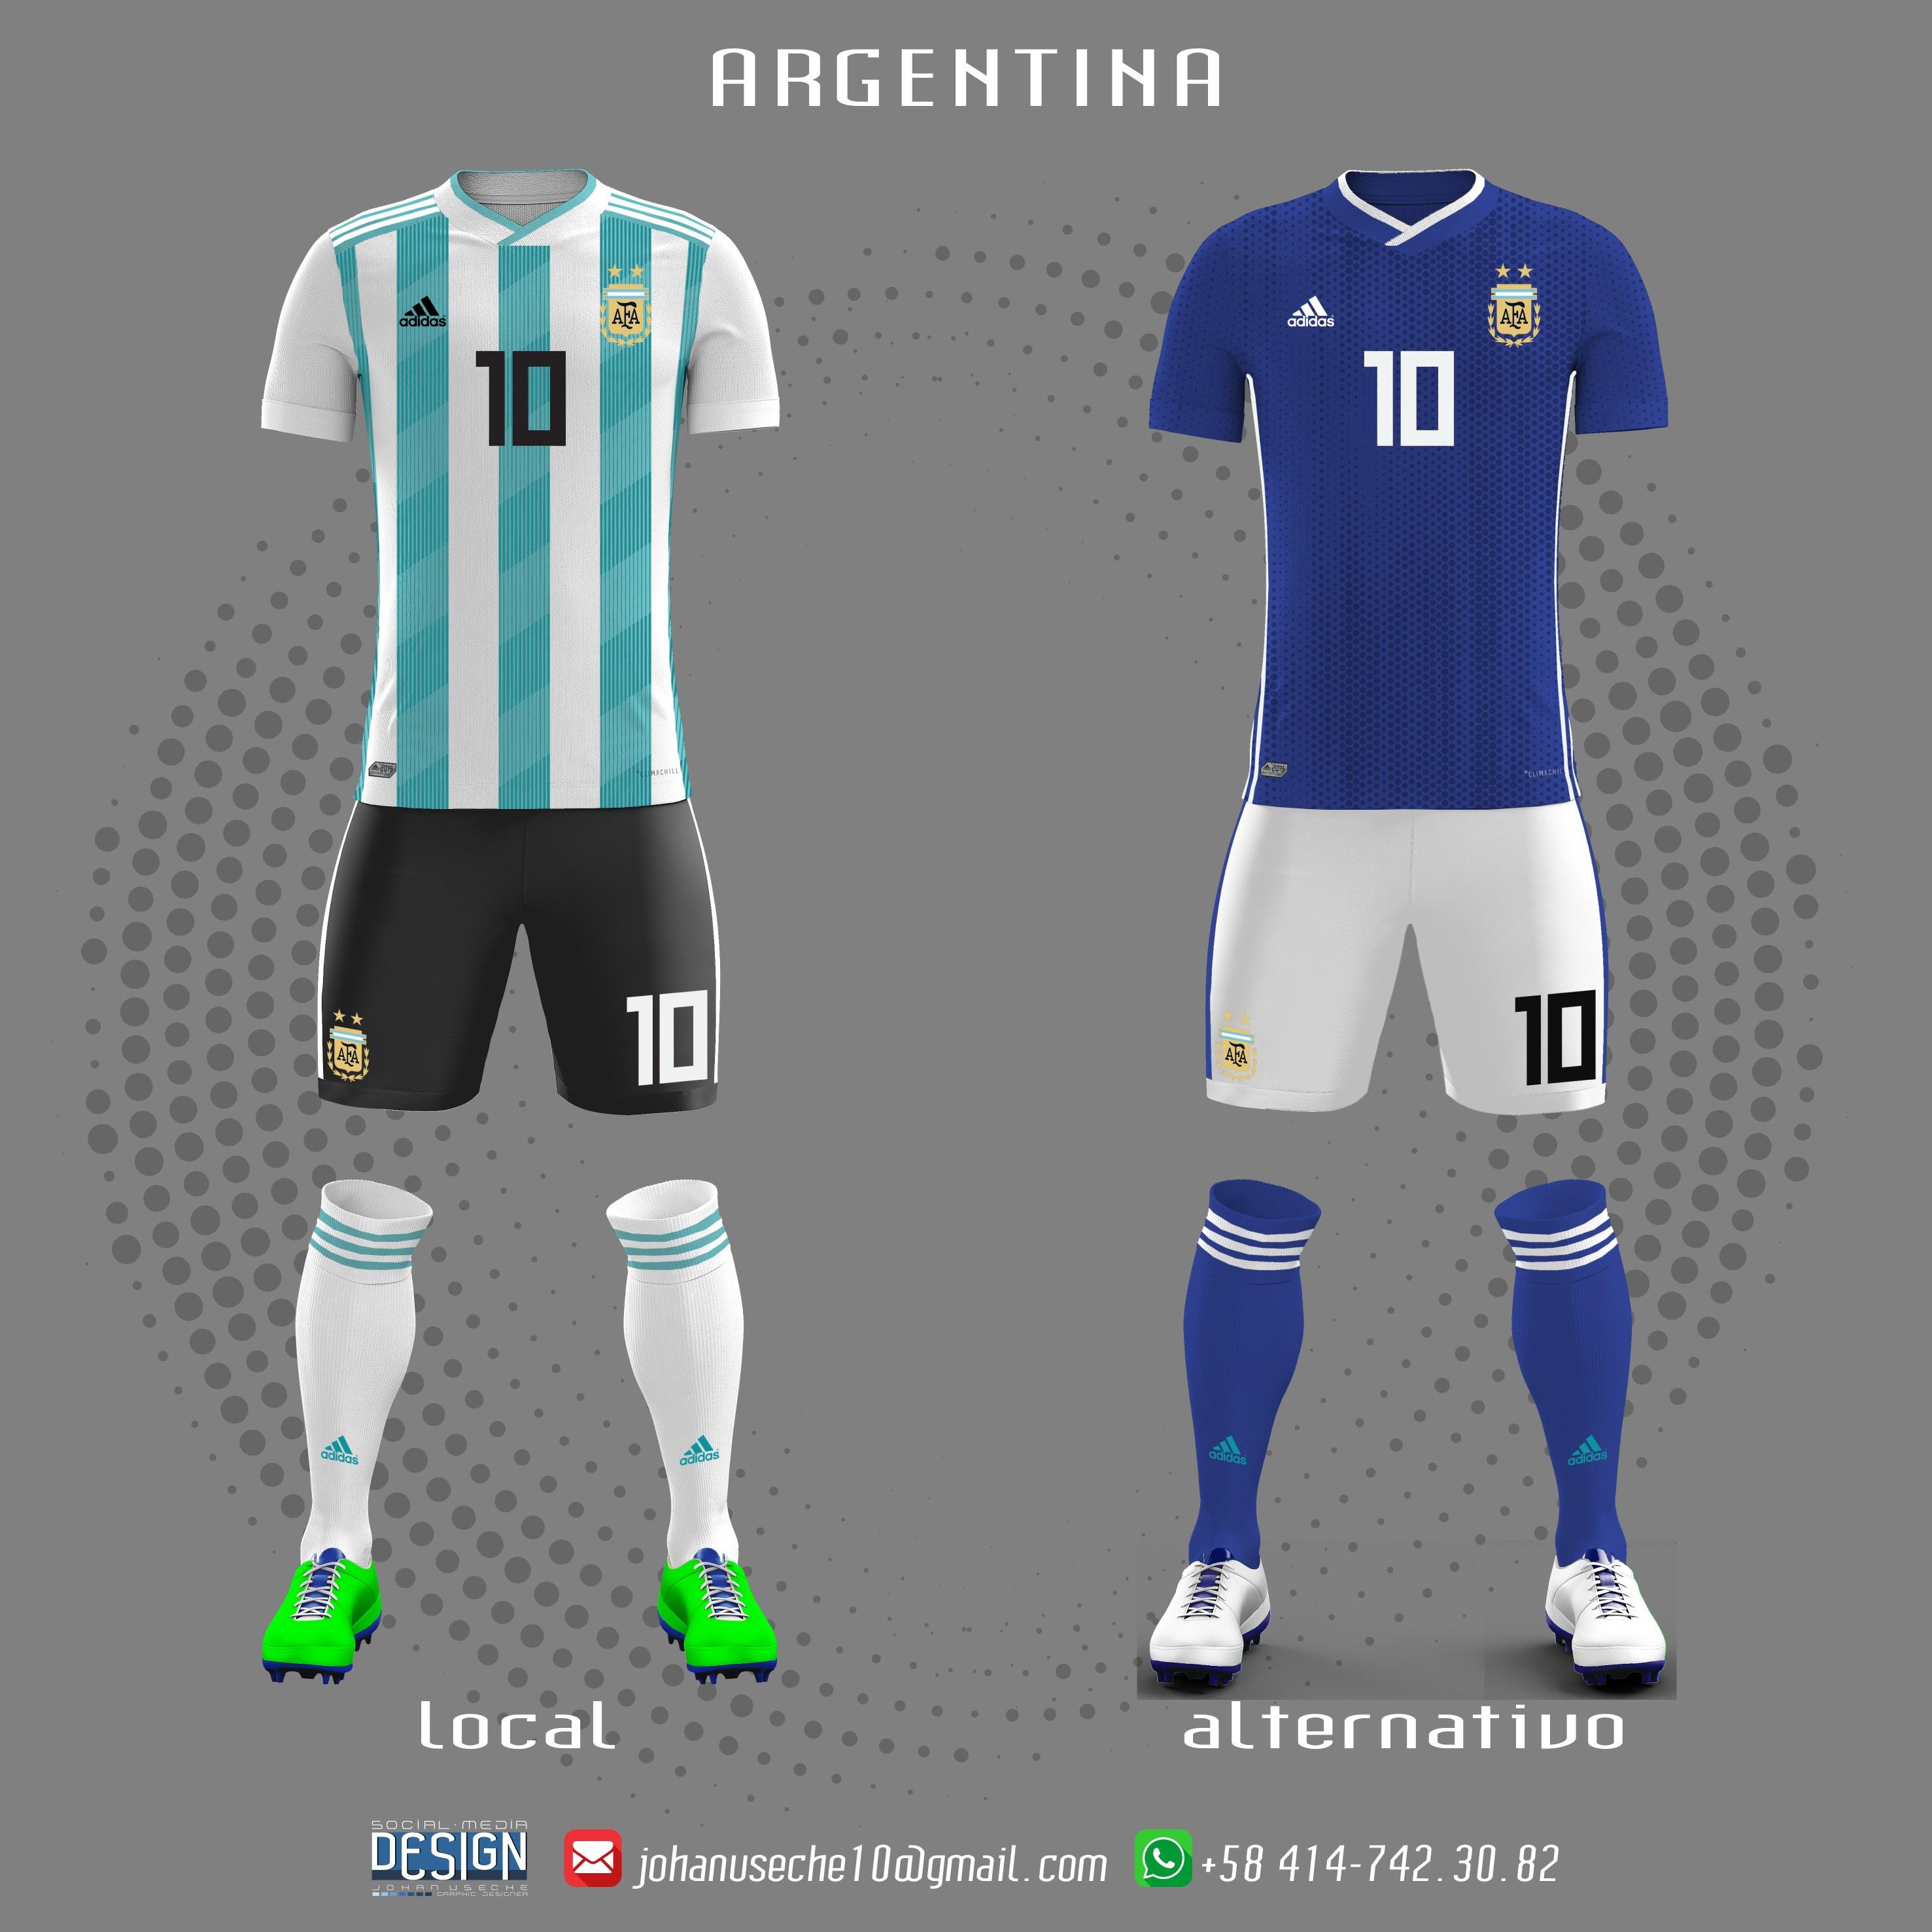 kit Argentina copa américa 2019 no oficial Copa América icial Camisetas